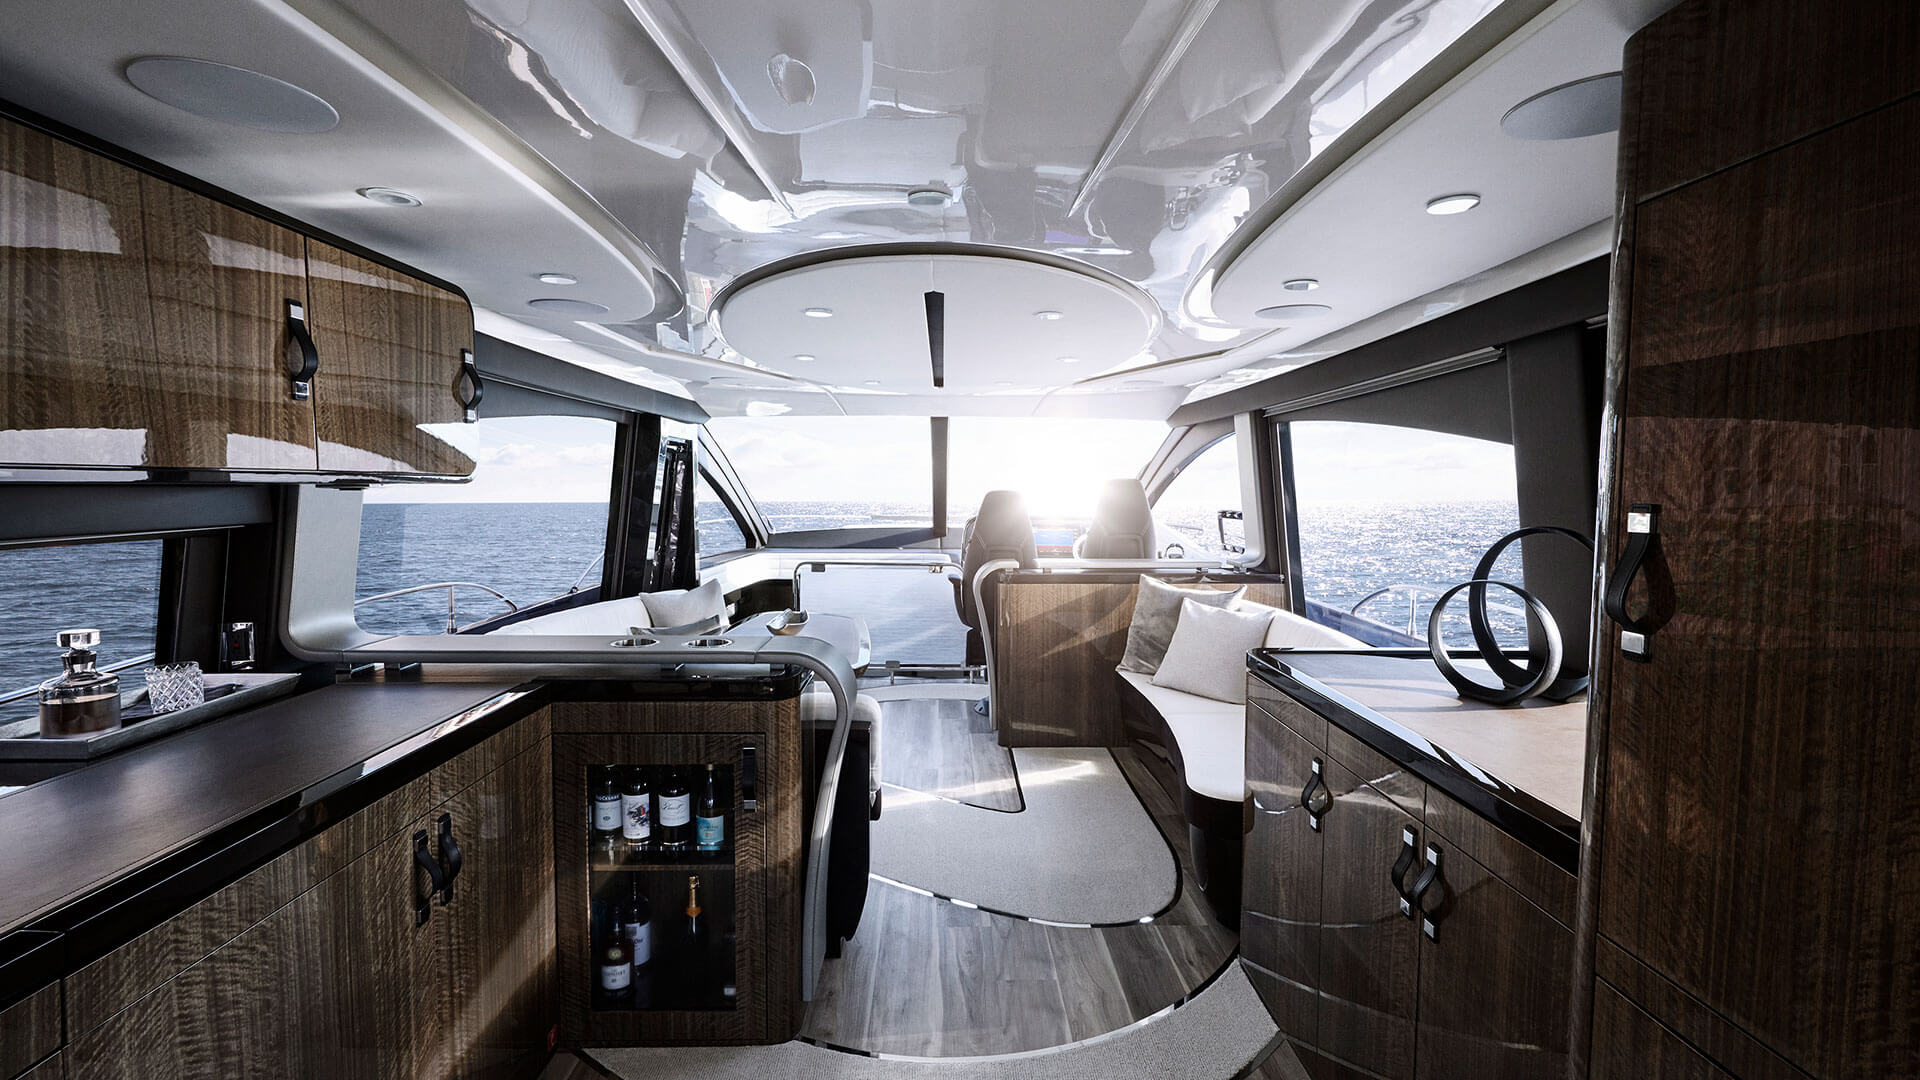 2020 lexus yacht ly 650 premiere gallery 02